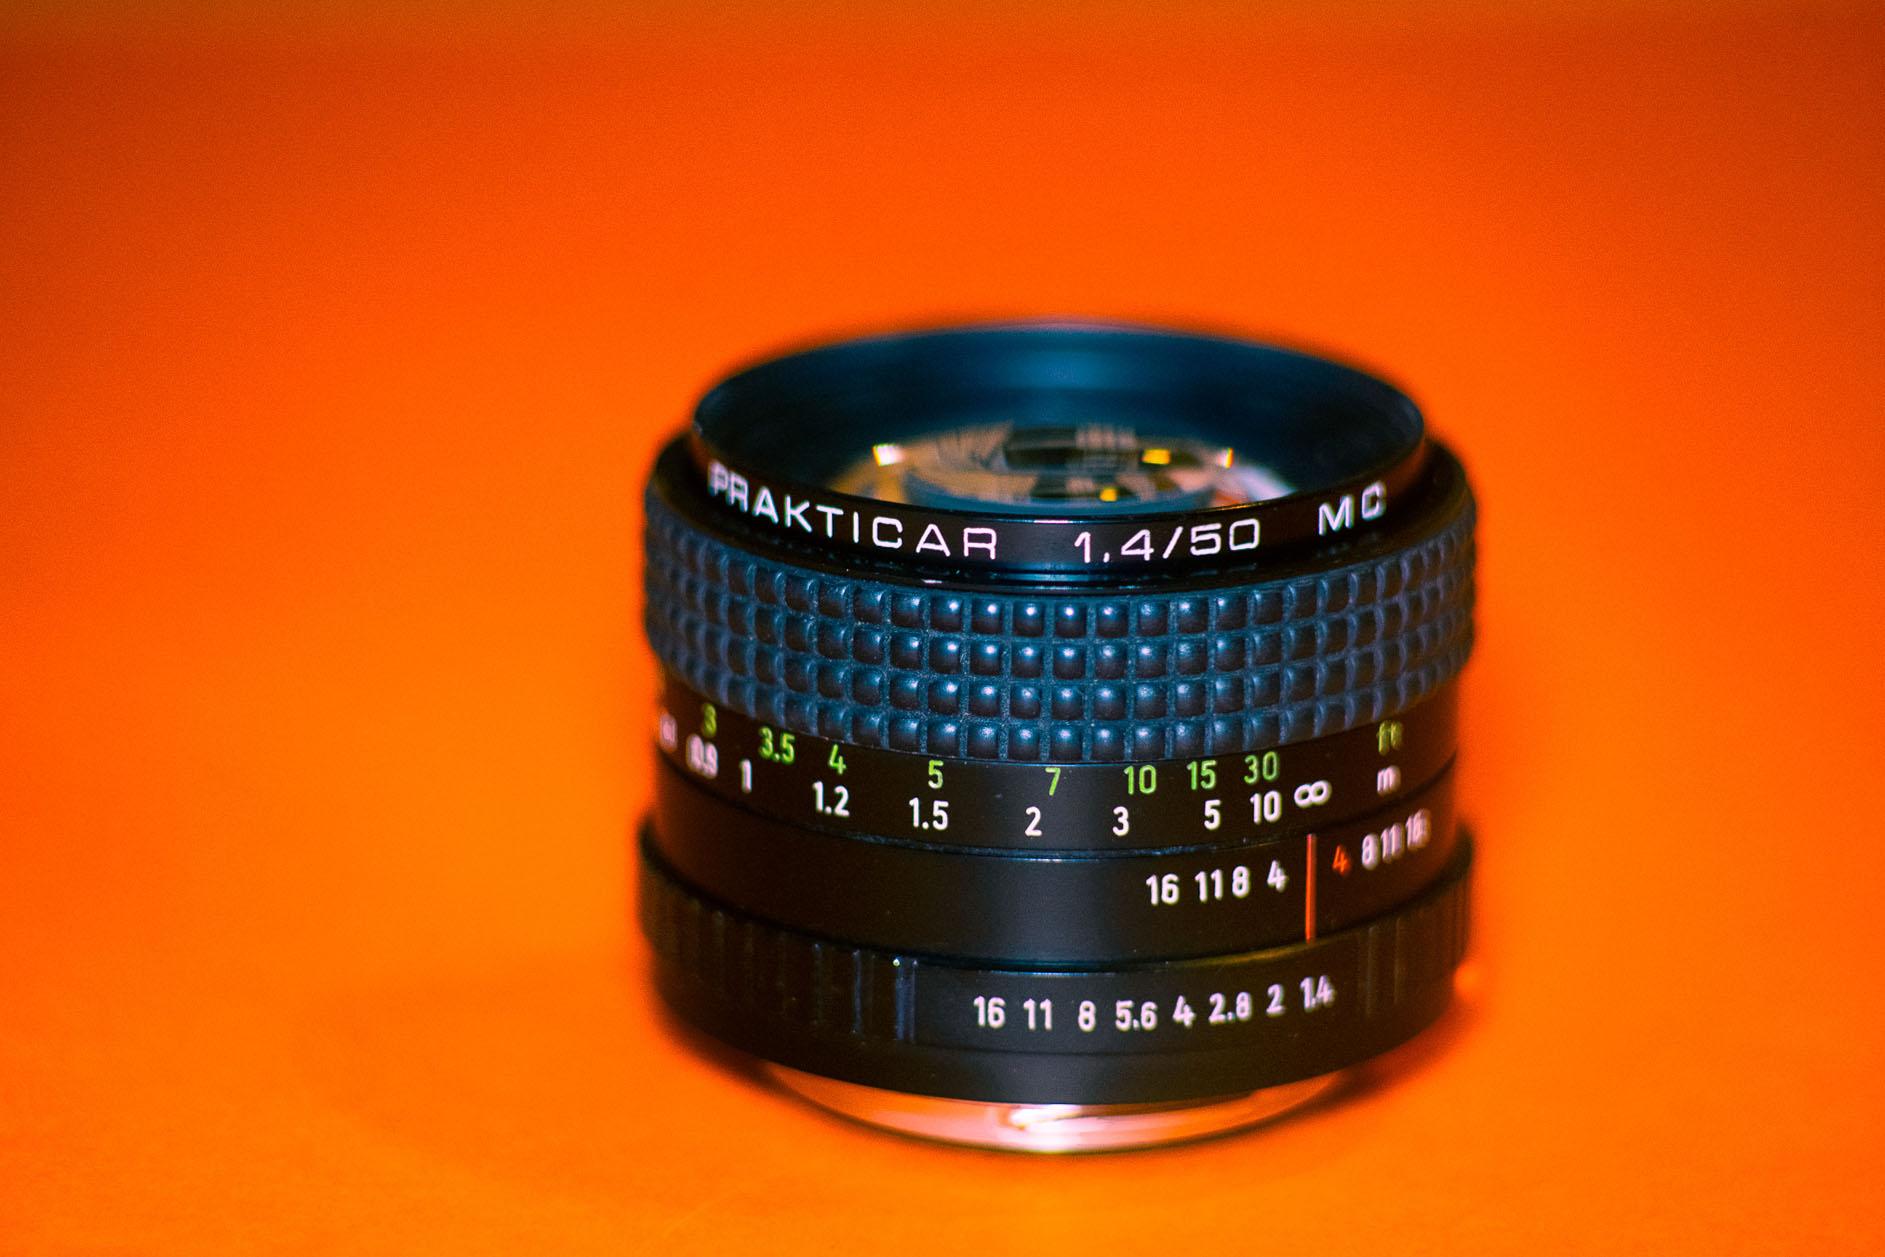 Carl Zeiss Jena Prakticar 50mm f1.4